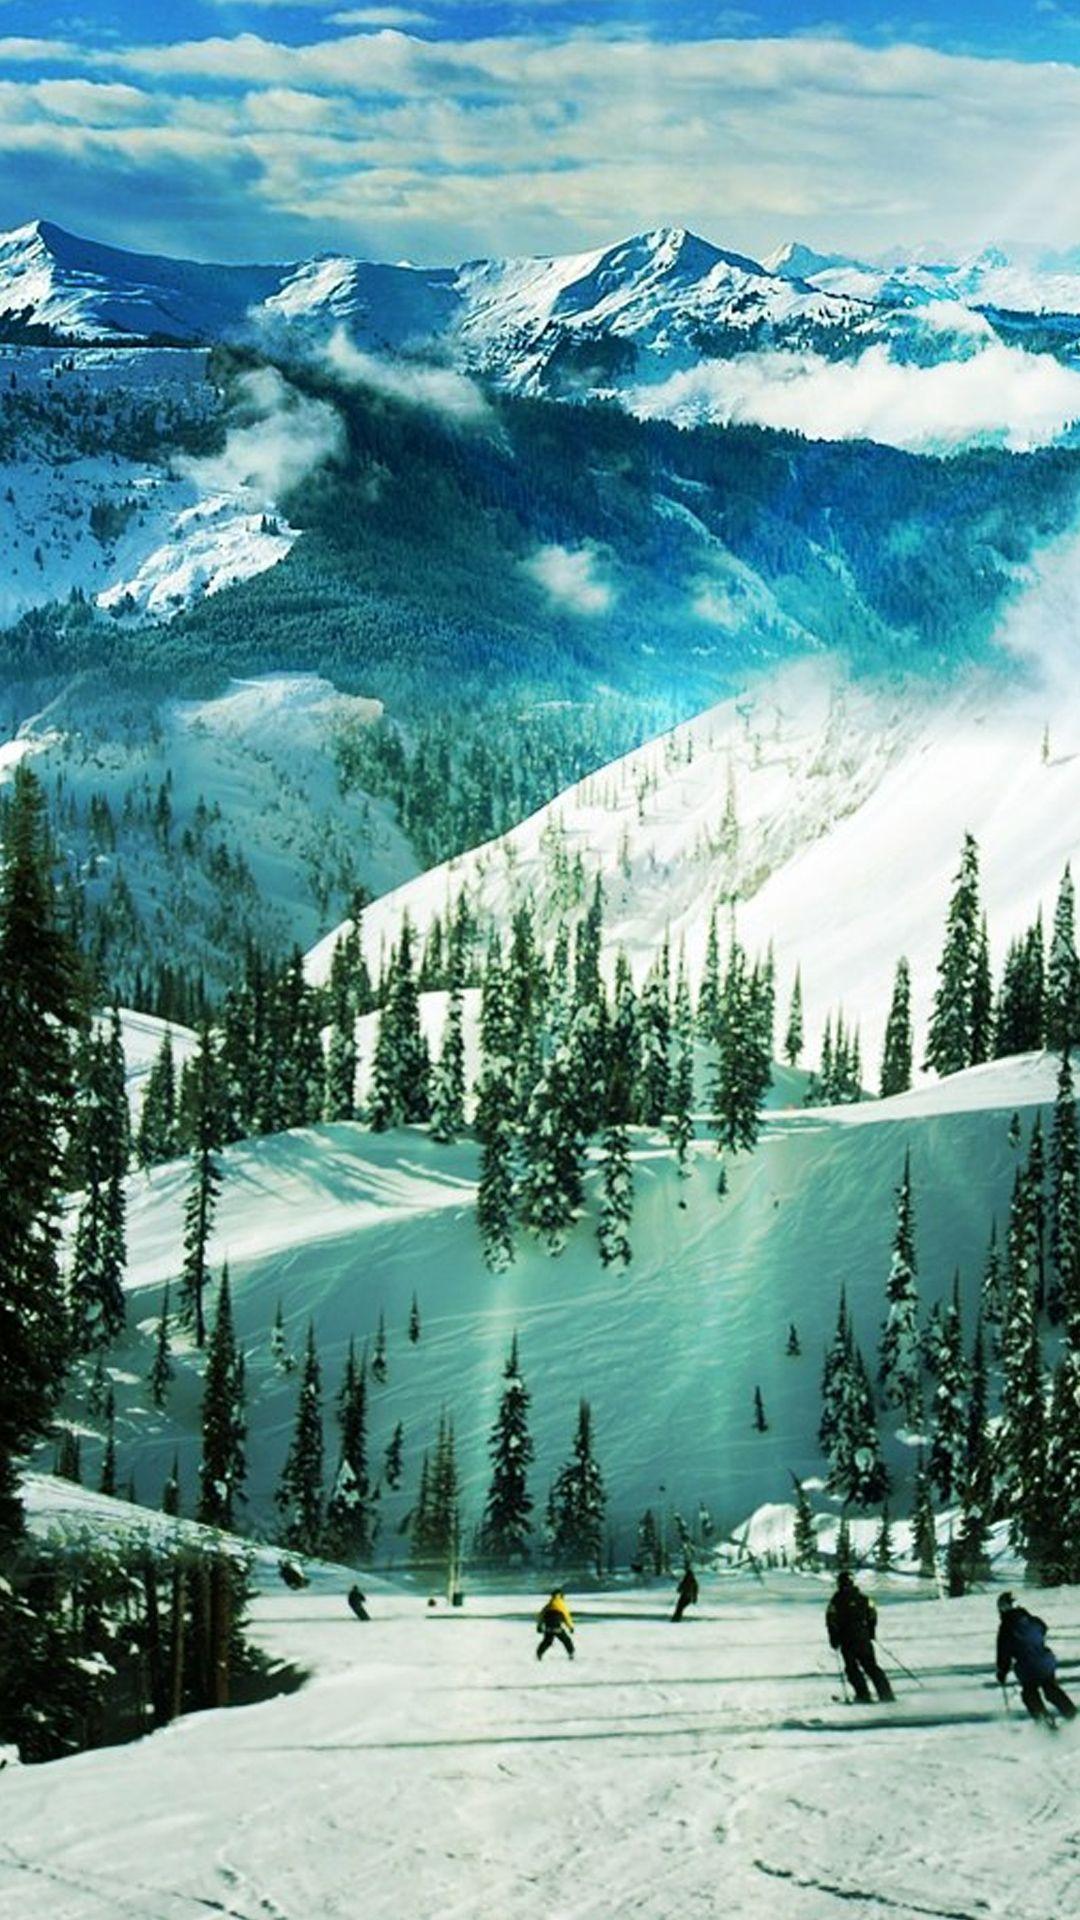 Wallpaper iphone winter - 60 Beautiful Nature Wallpaper Free To Download